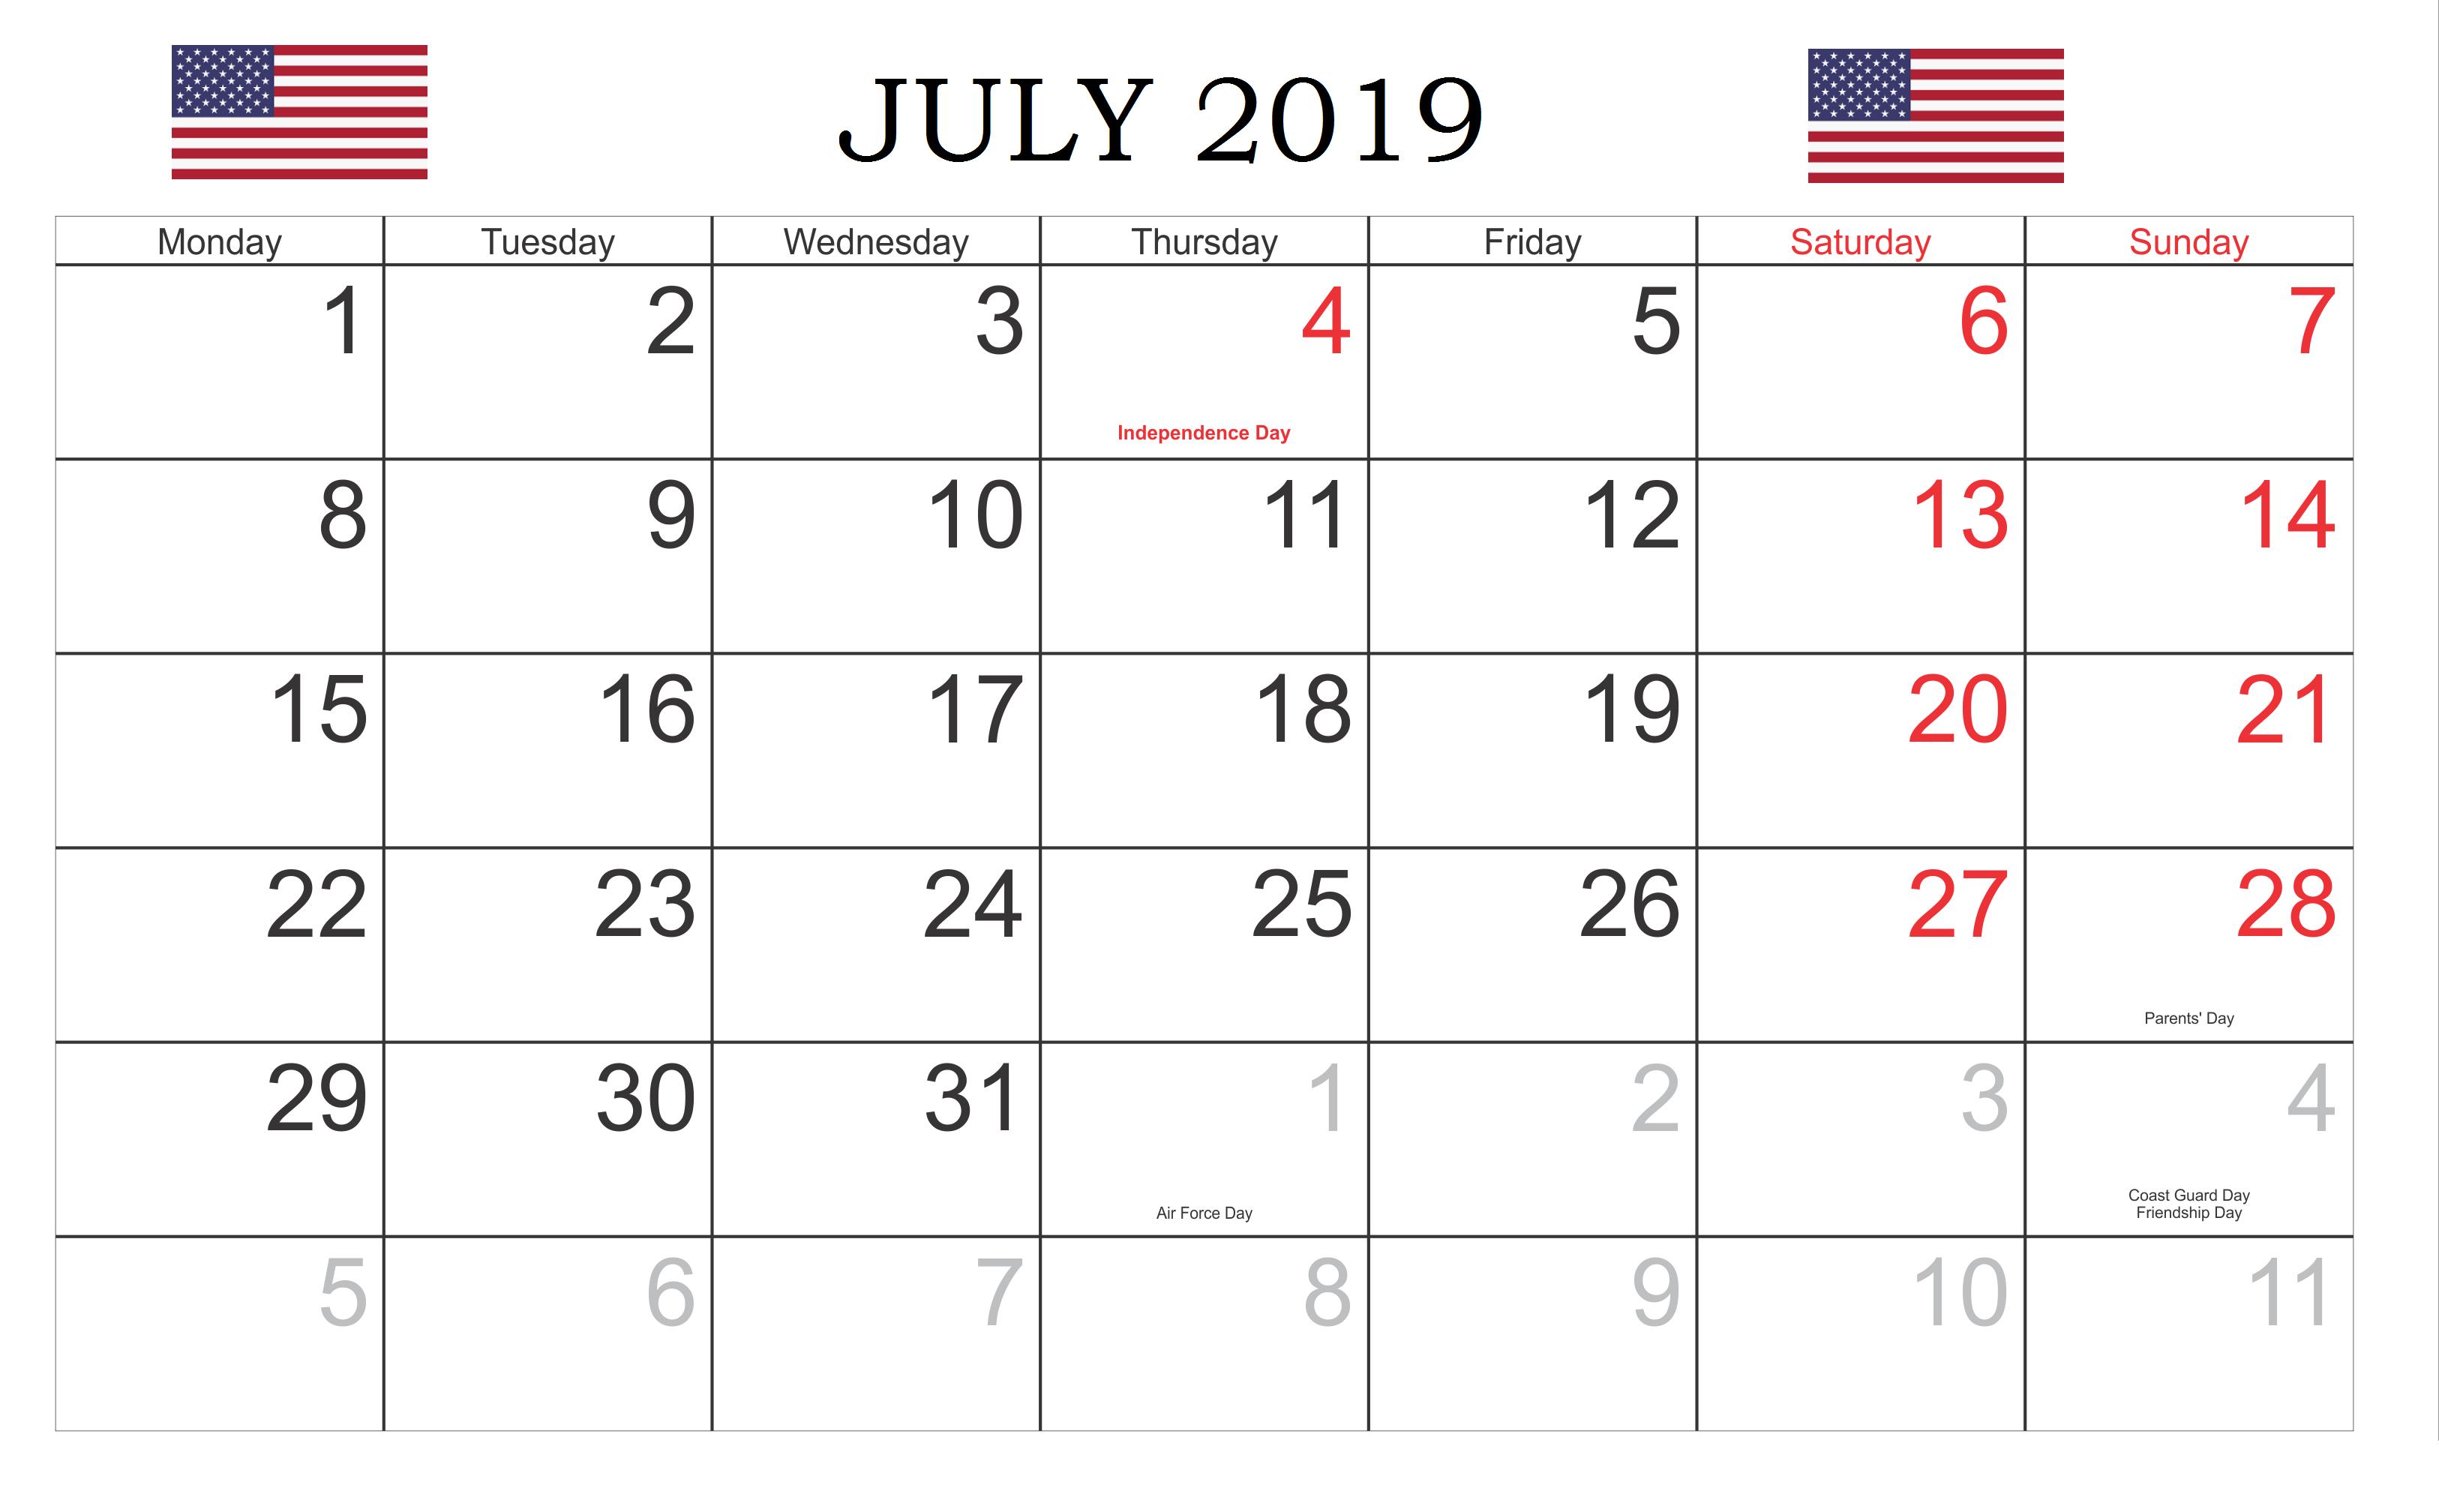 July 2019 USA Holidays Calendar Local and Federal